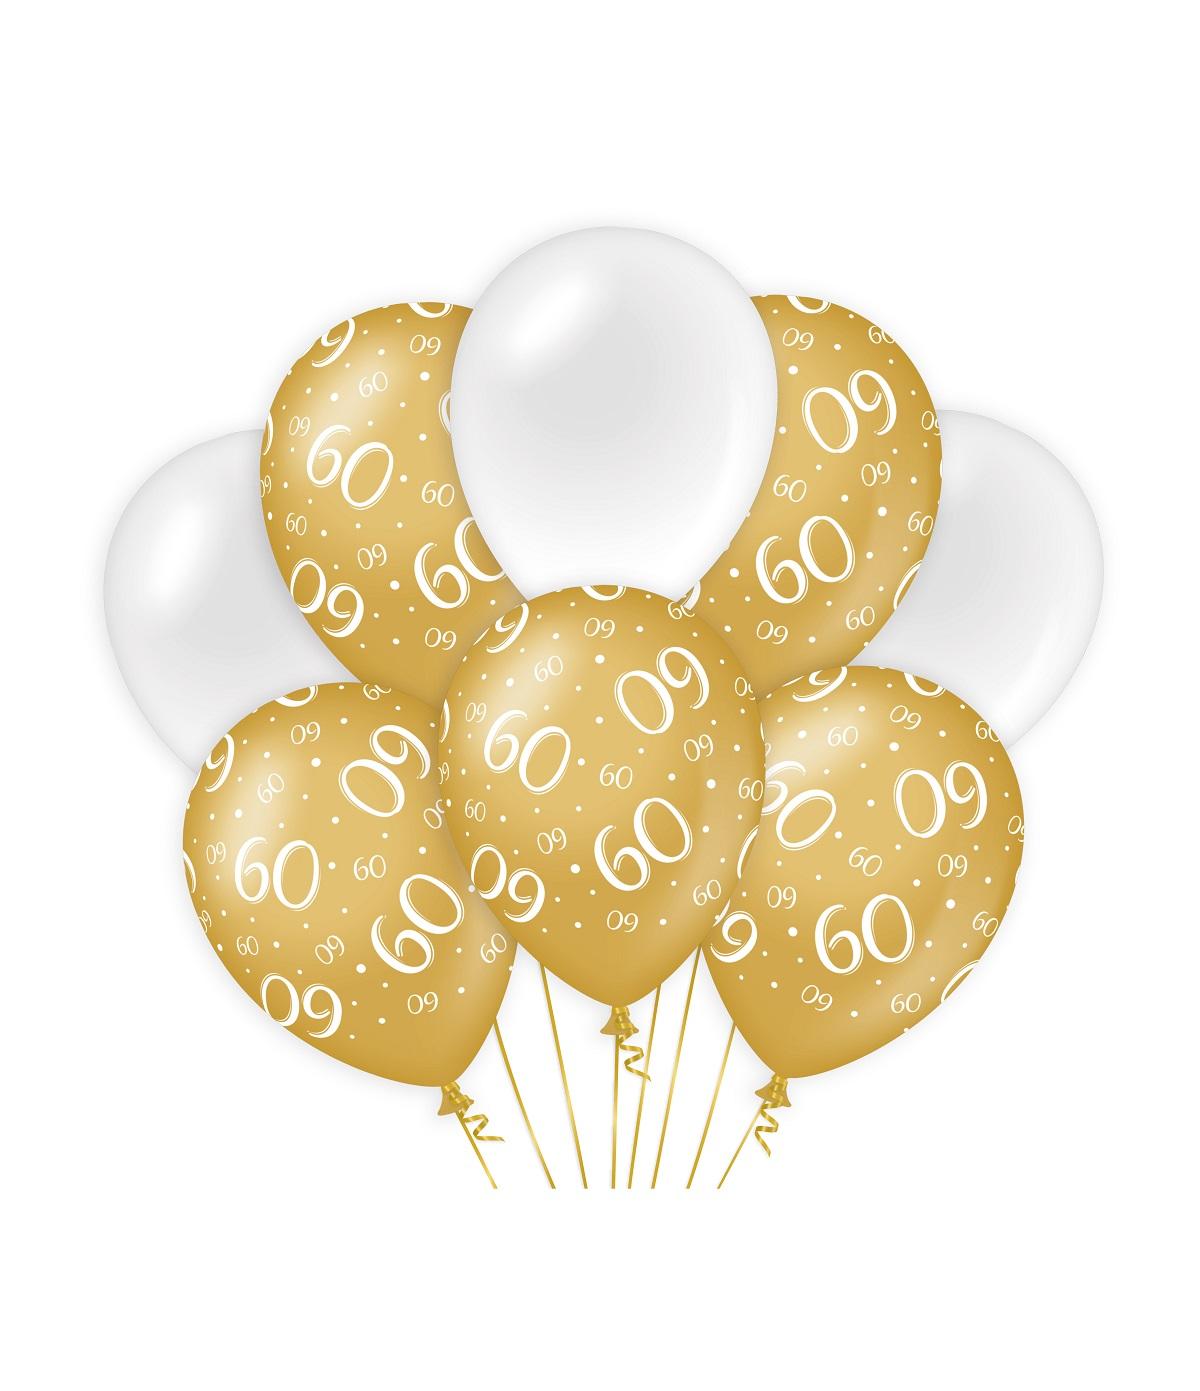 "8st Ballonnen 60 Jaar Goud/Wit 12"""